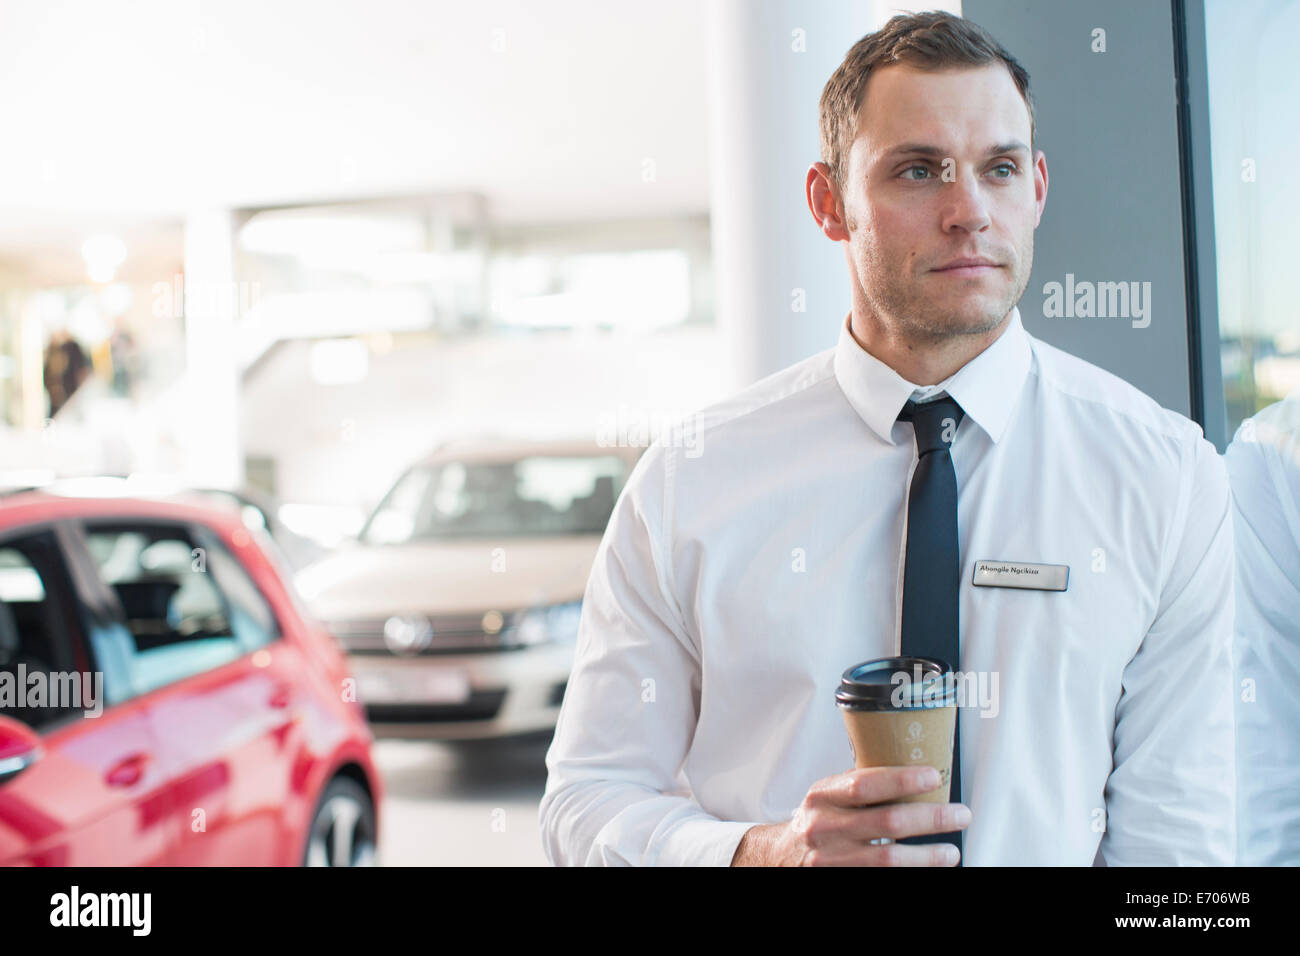 Portrait of worried salesman with takeaway coffee in car dealership - Stock Image